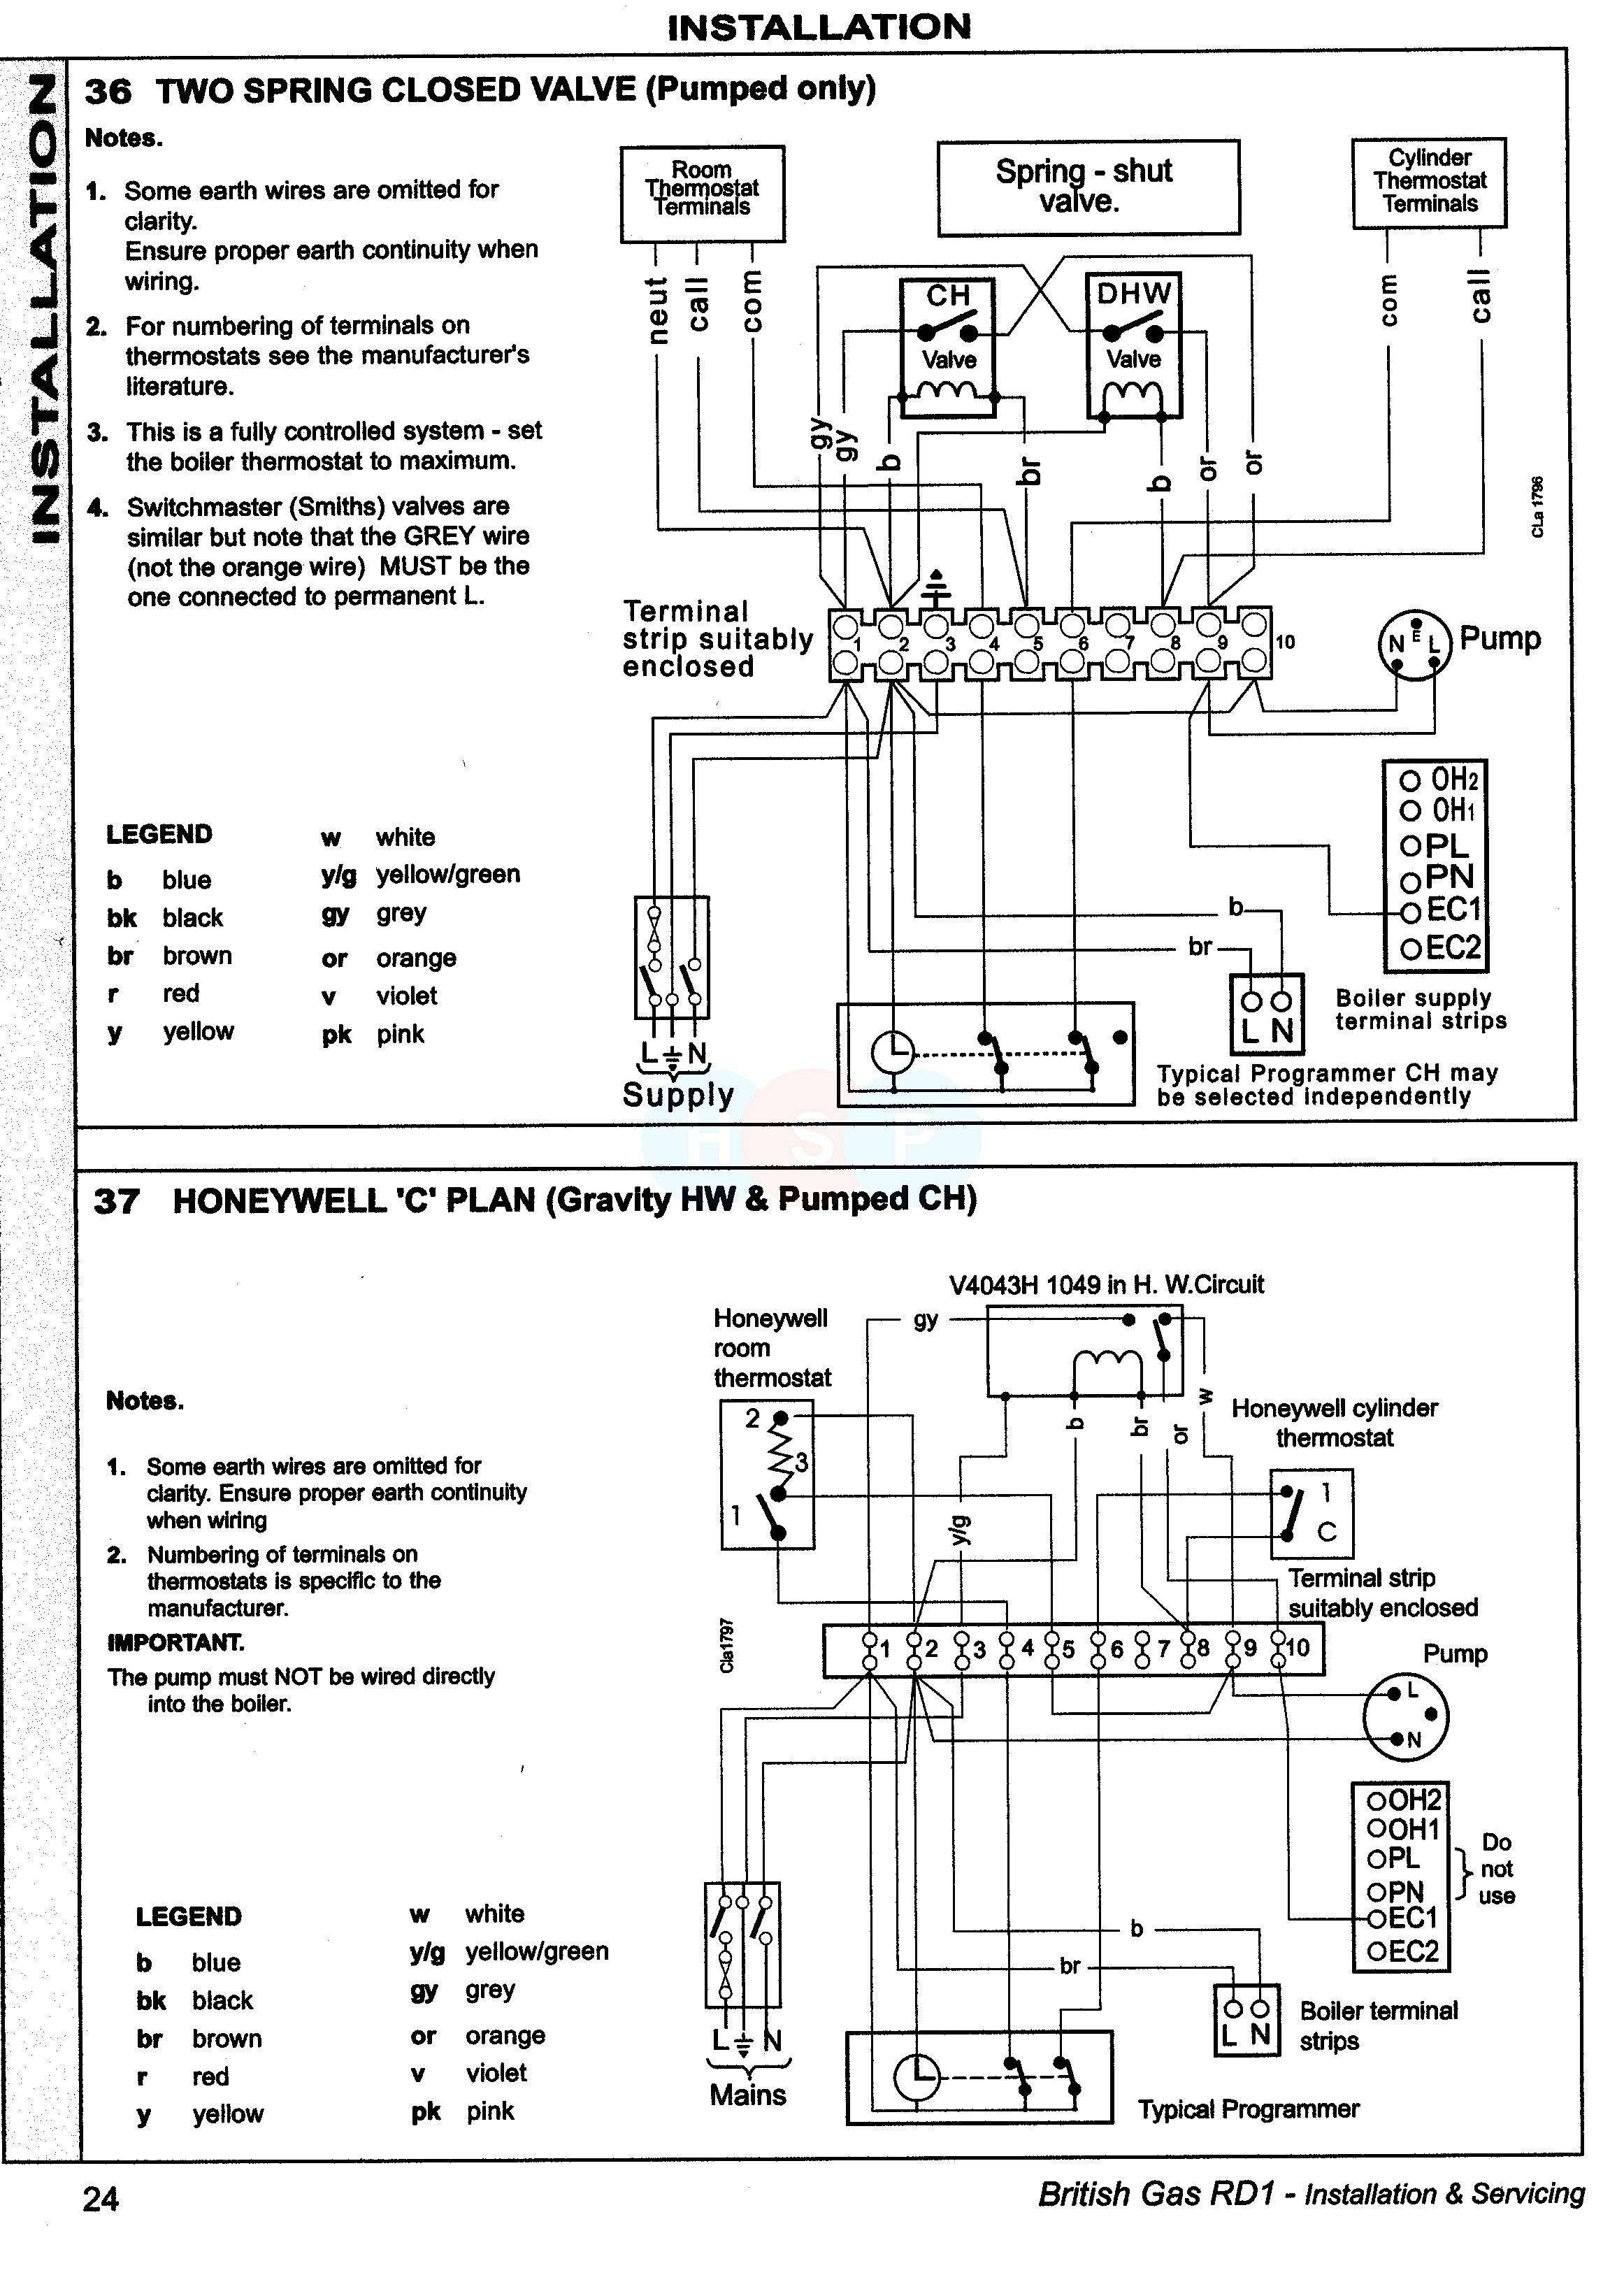 medium resolution of lovely wiring diagram for honeywell s plan diagrams digramssample diagramimages wiringdiagramsample